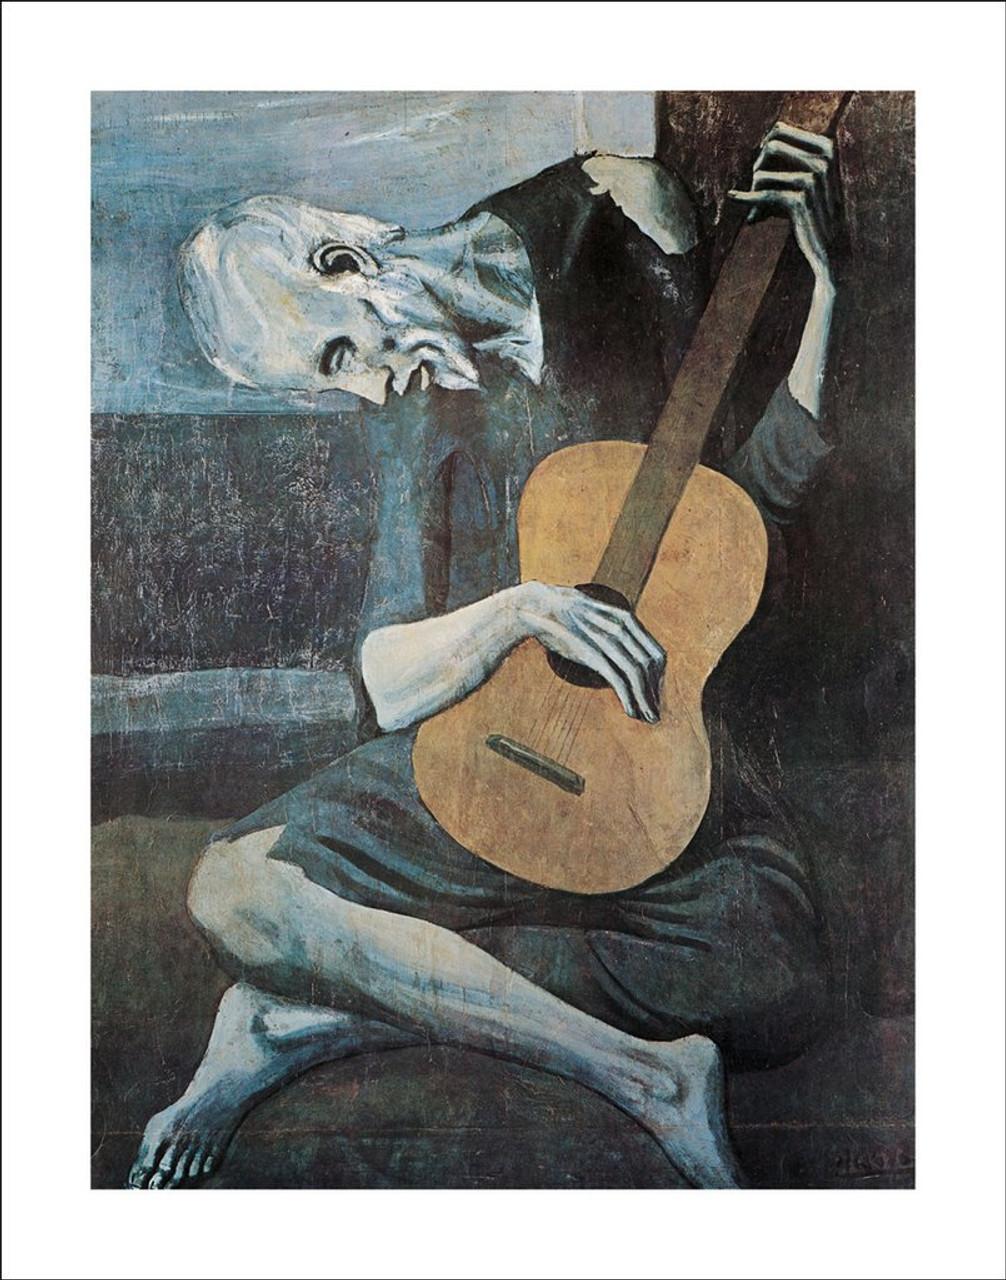 Pablo Picasso Old Guitarist Decorative Fine Art Poster Print 22 by 28